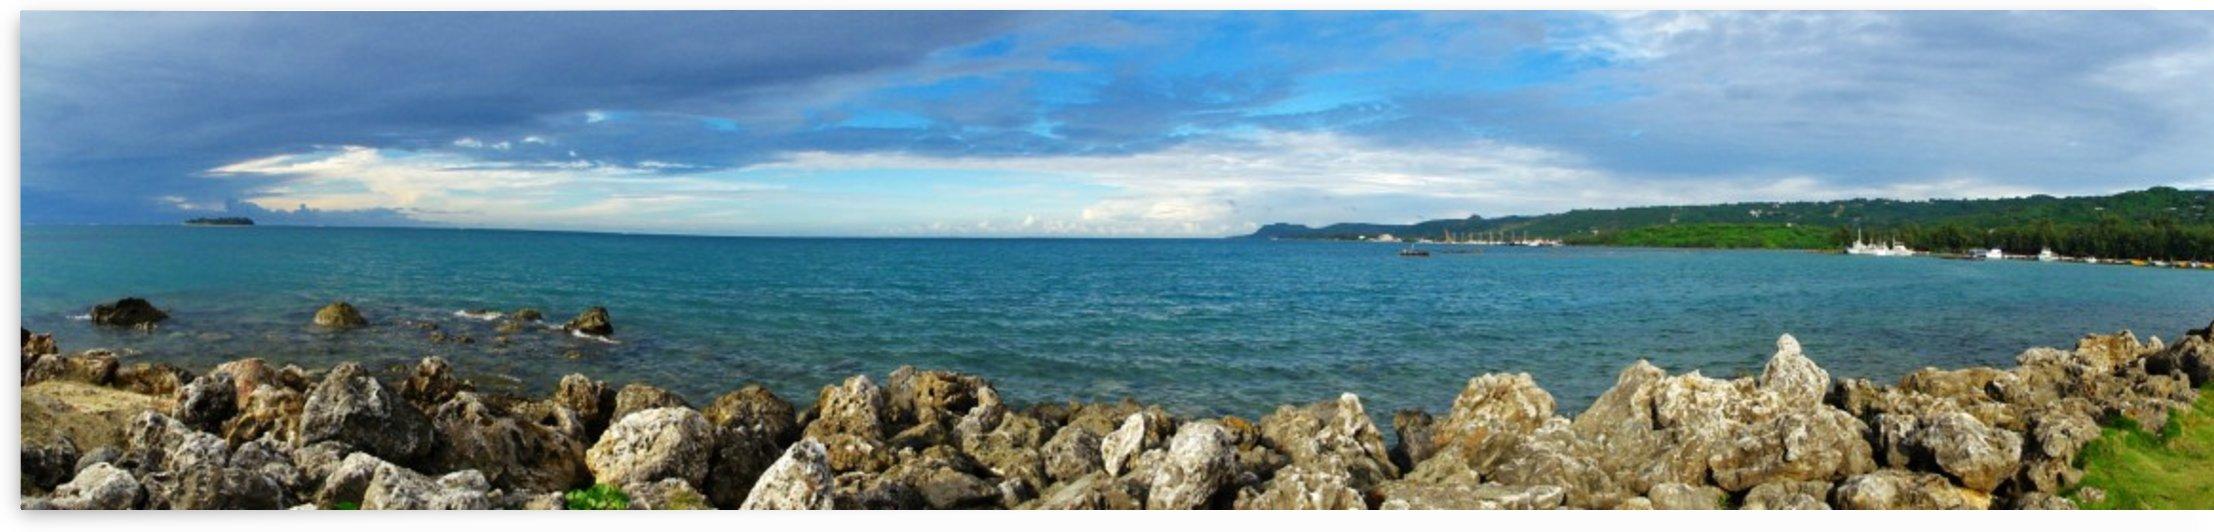 Panoramic view of Smiling Cove Marina Saipan by On da Raks